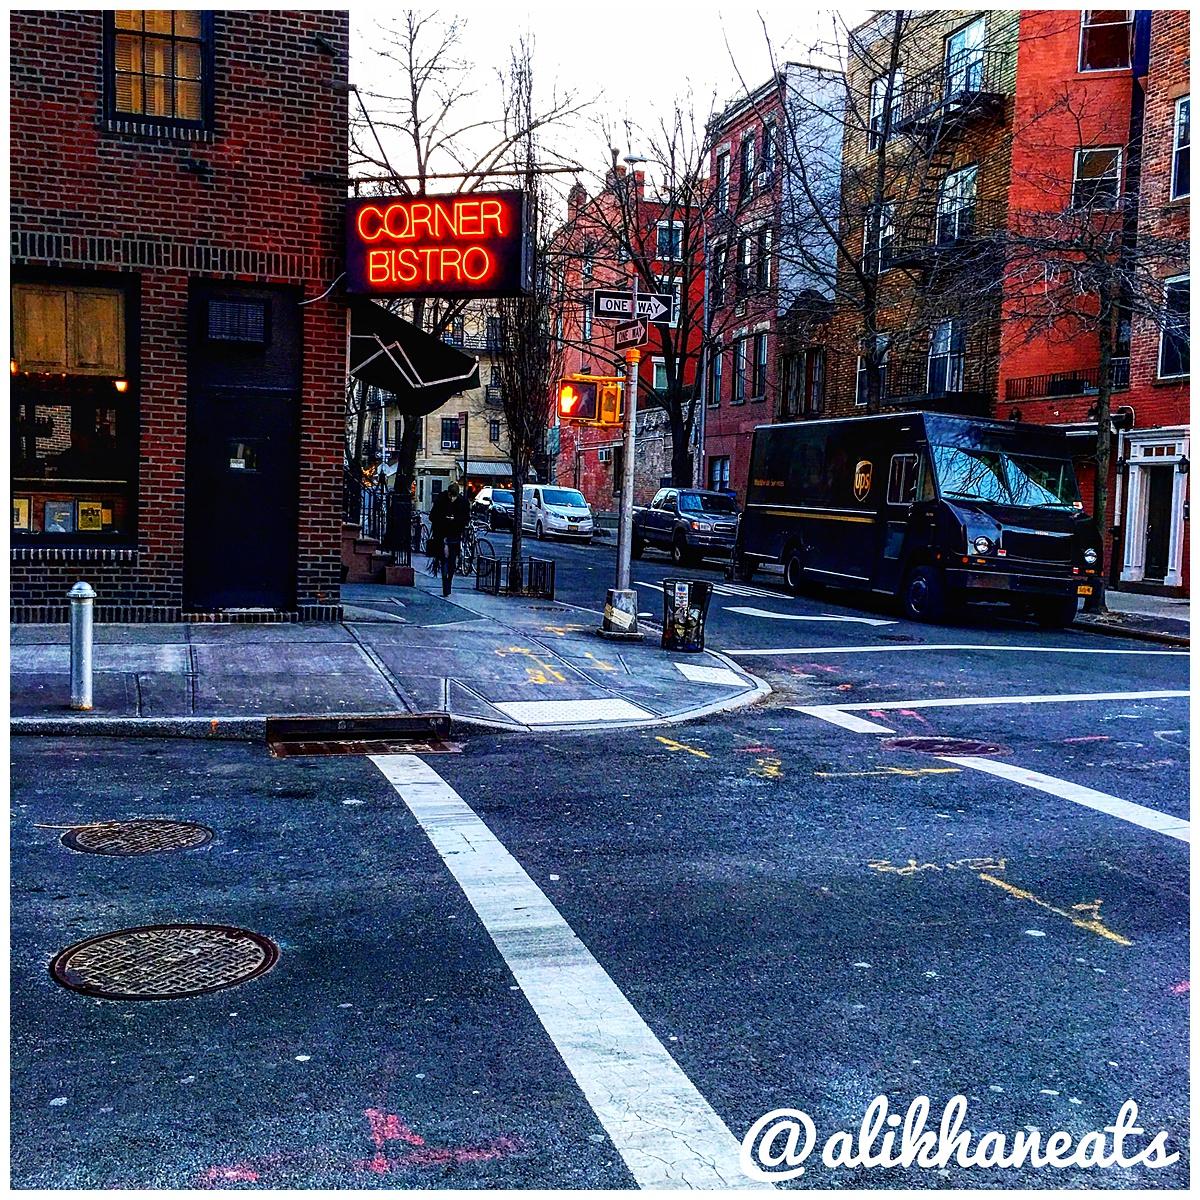 Corner Bistro street sign